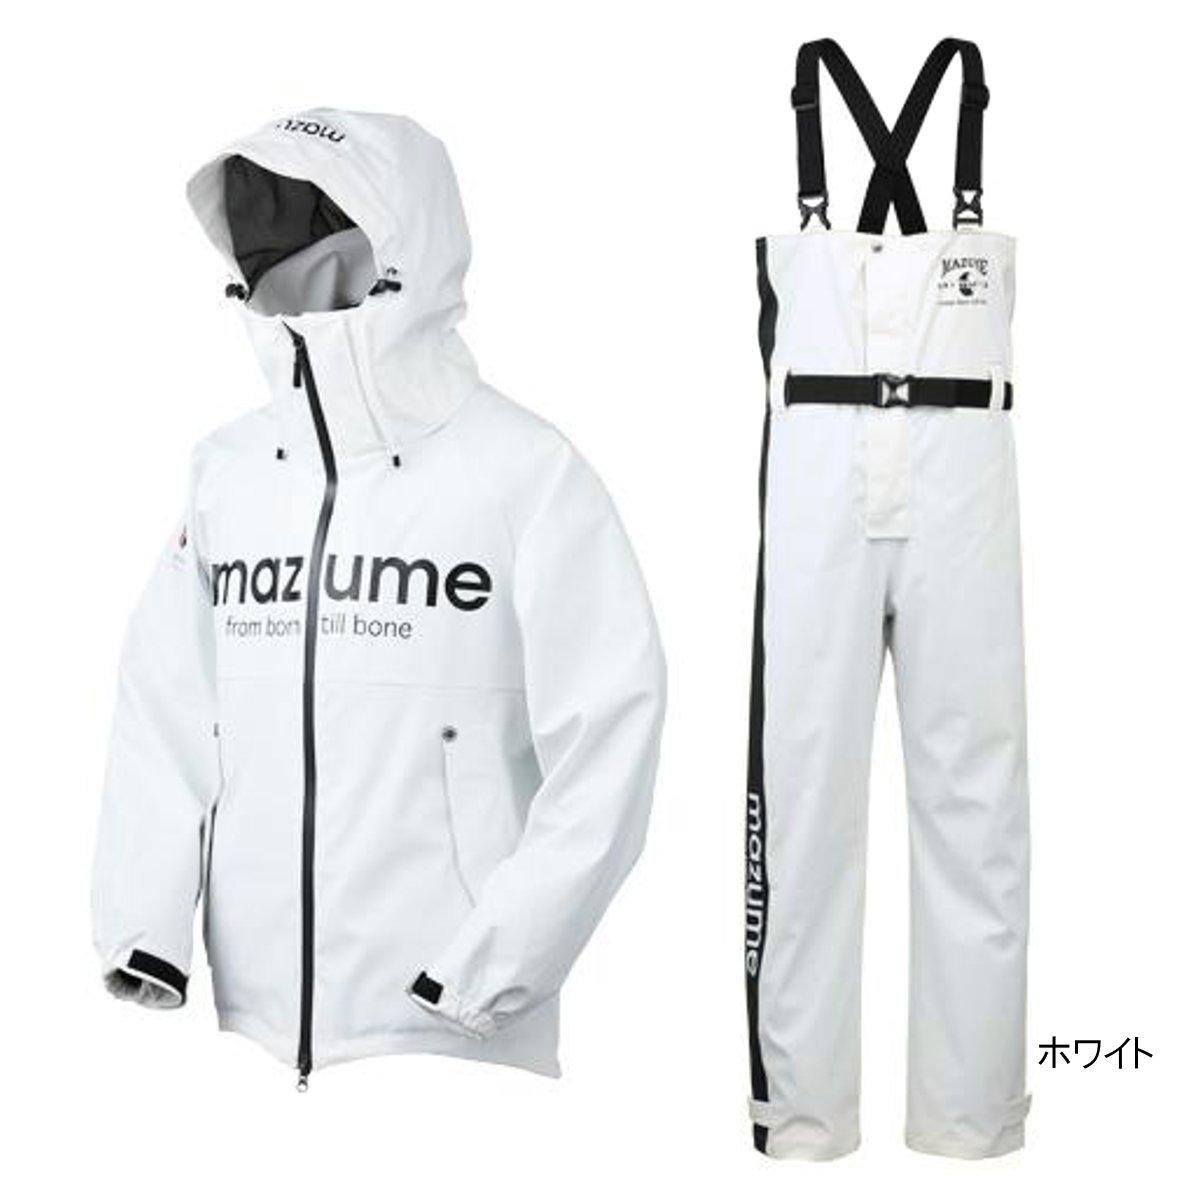 mazume ROUGH WATER レインスーツ II MZRS-383 L ホワイト(東日本店)